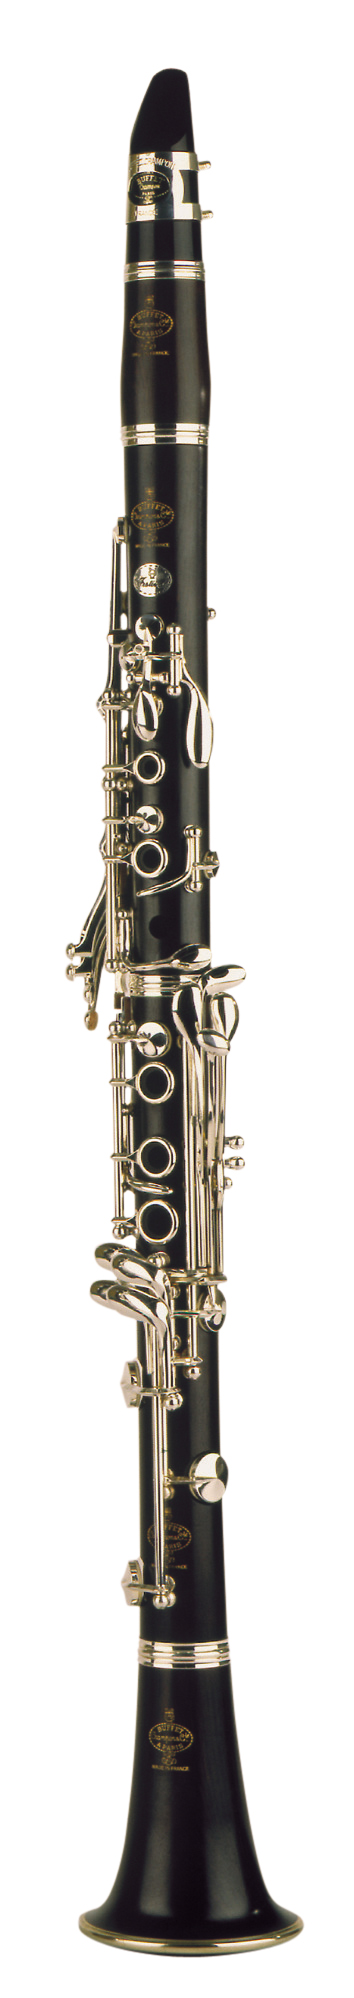 Buffet - BC-1139L-2-0 - Festival - Holzblasinstrumente - Klarinetten | MUSIK BERTRAM Deutschland Freiburg